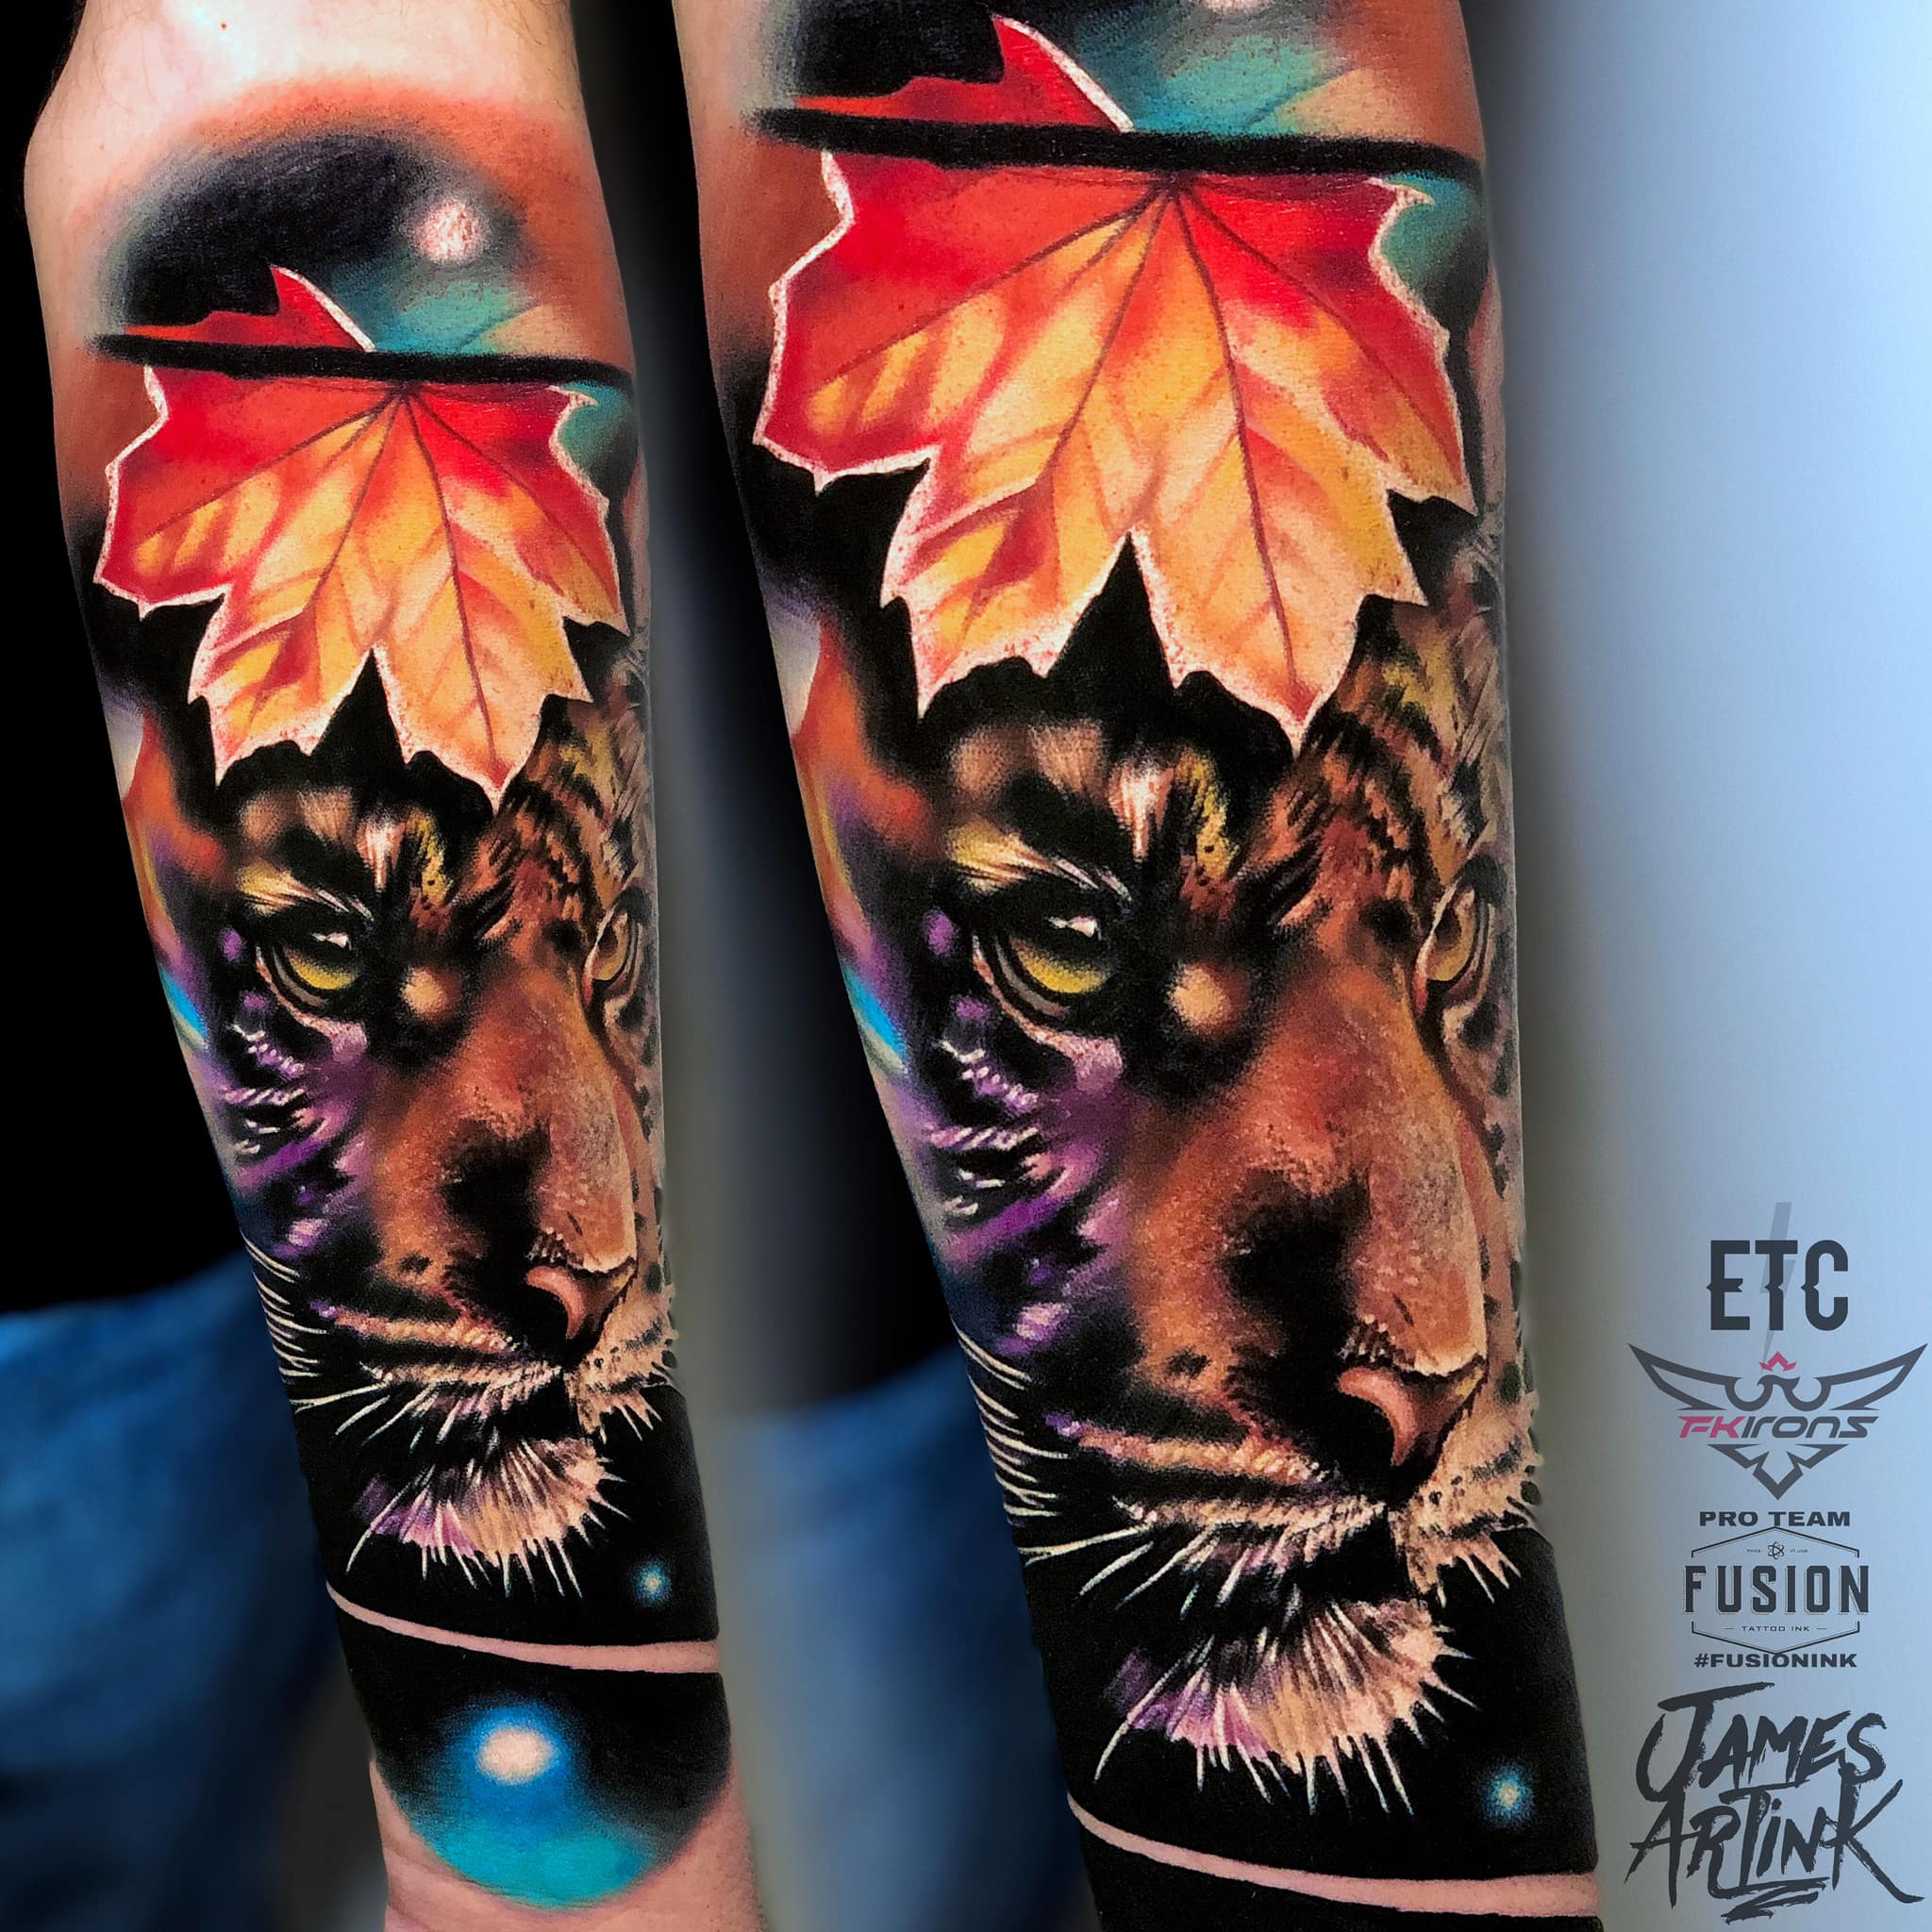 Inksearch tattoo James Artink